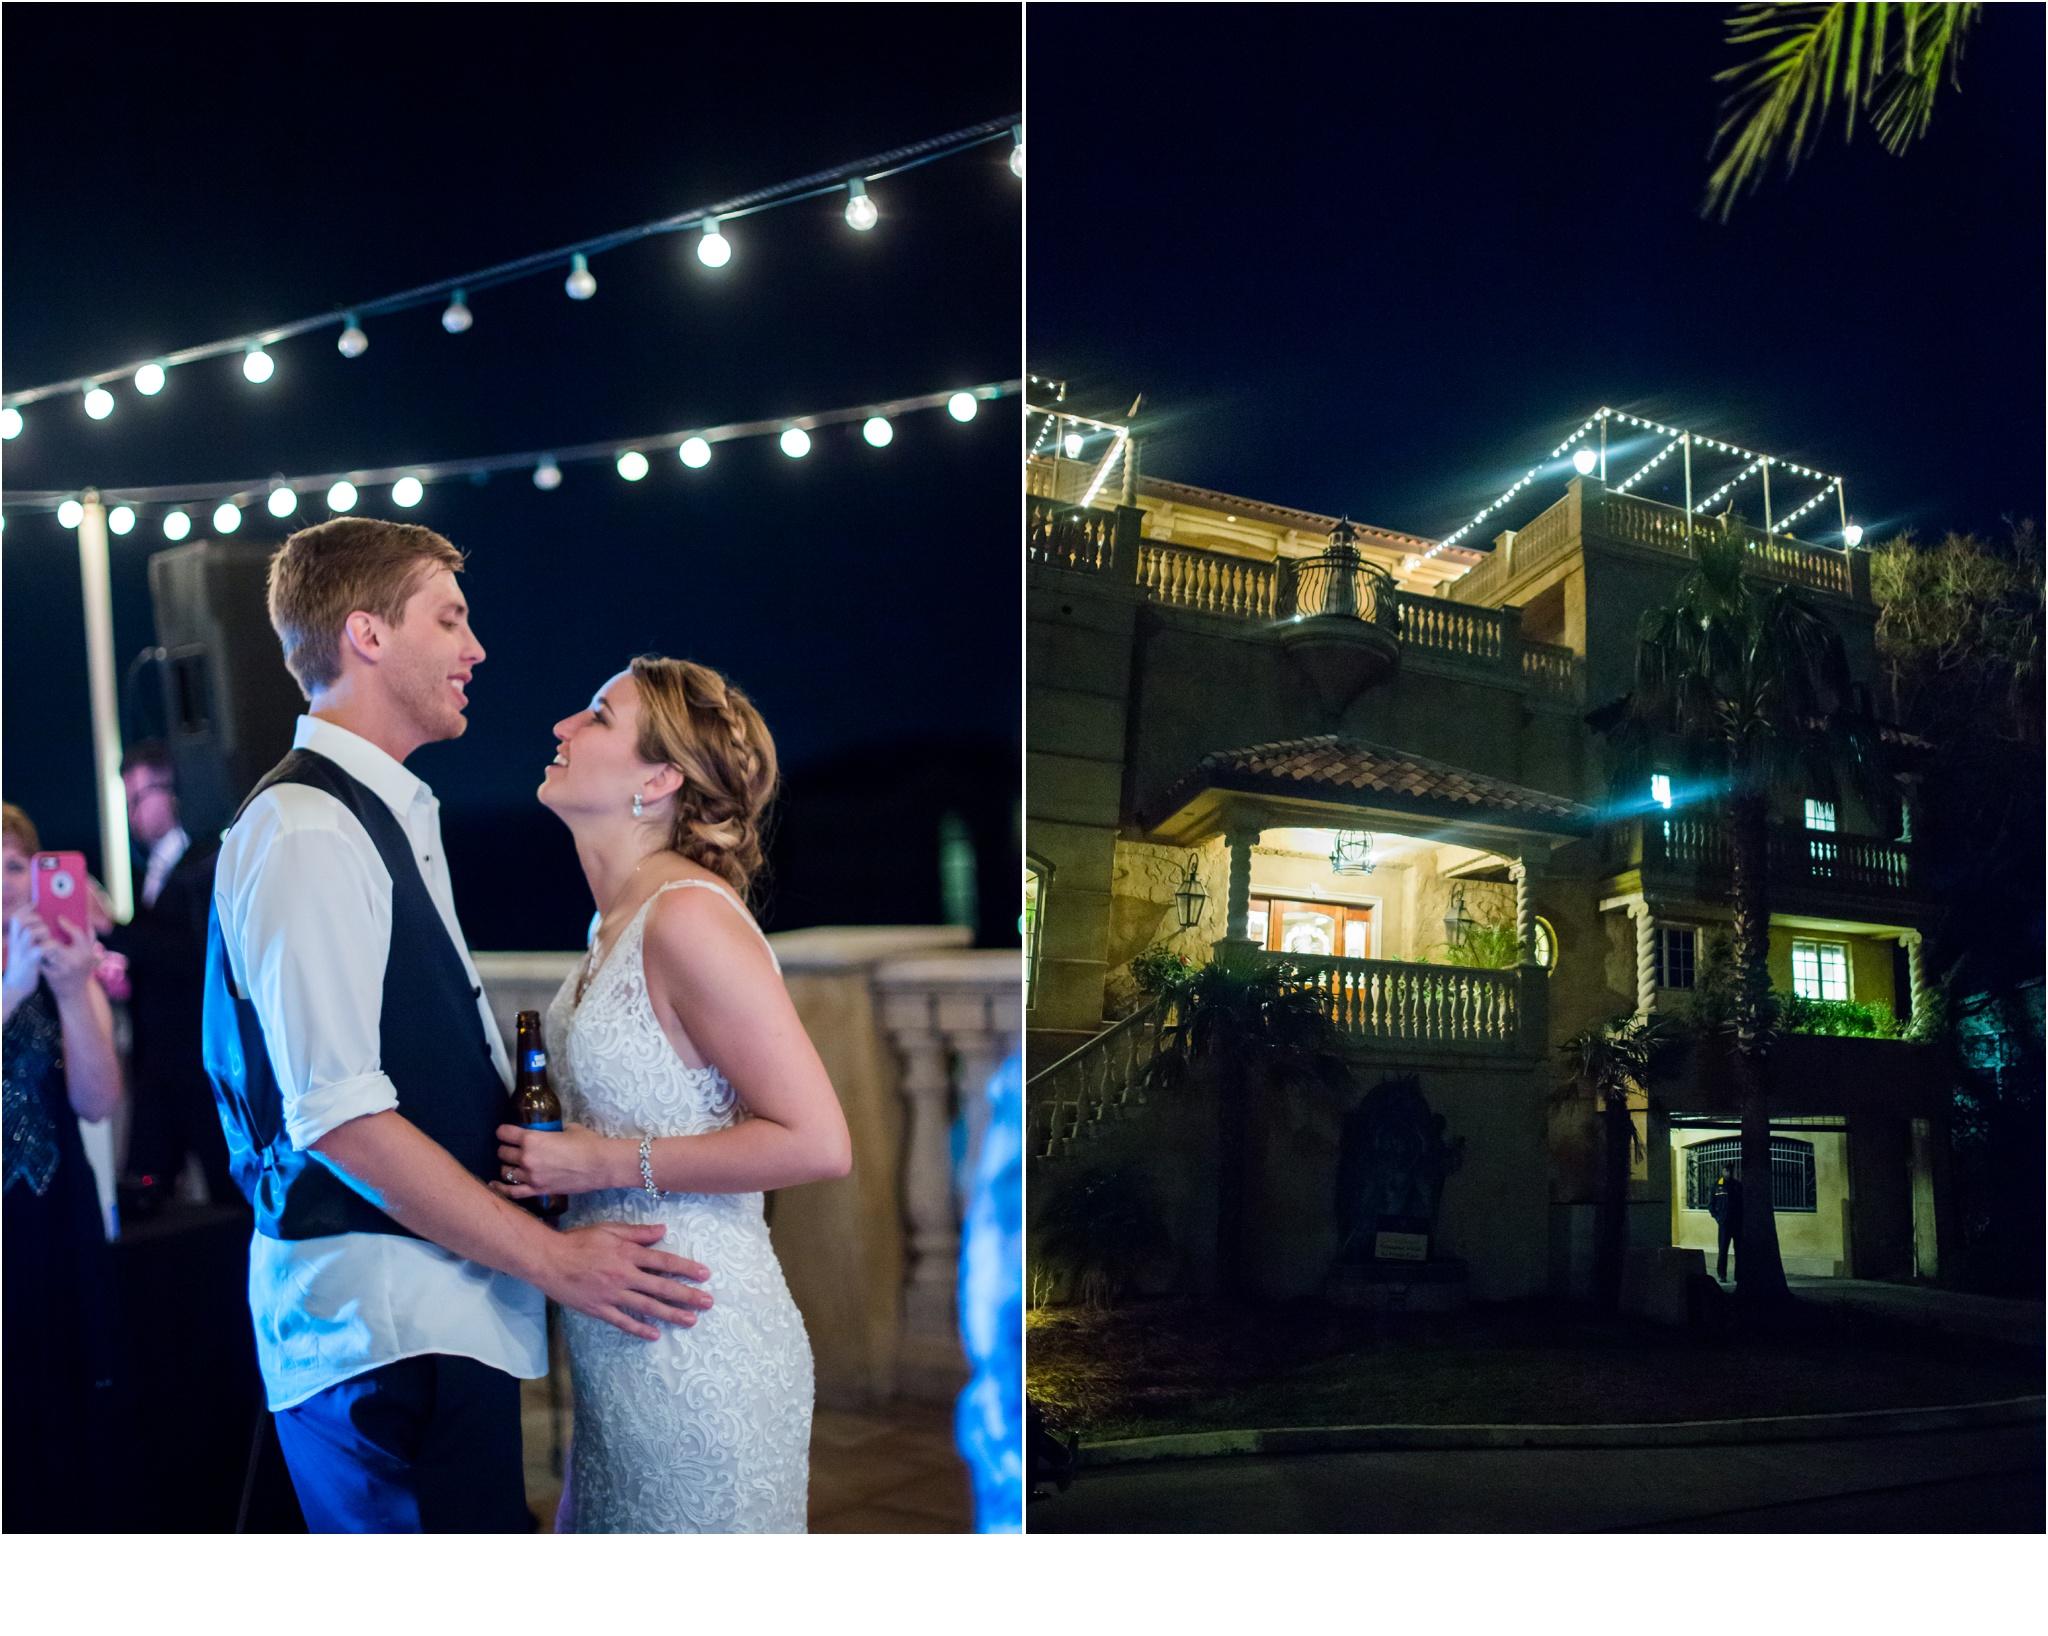 Rainey_Gregg_Photography_St._Simons_Island_Georgia_California_Wedding_Portrait_Photography_0692.jpg